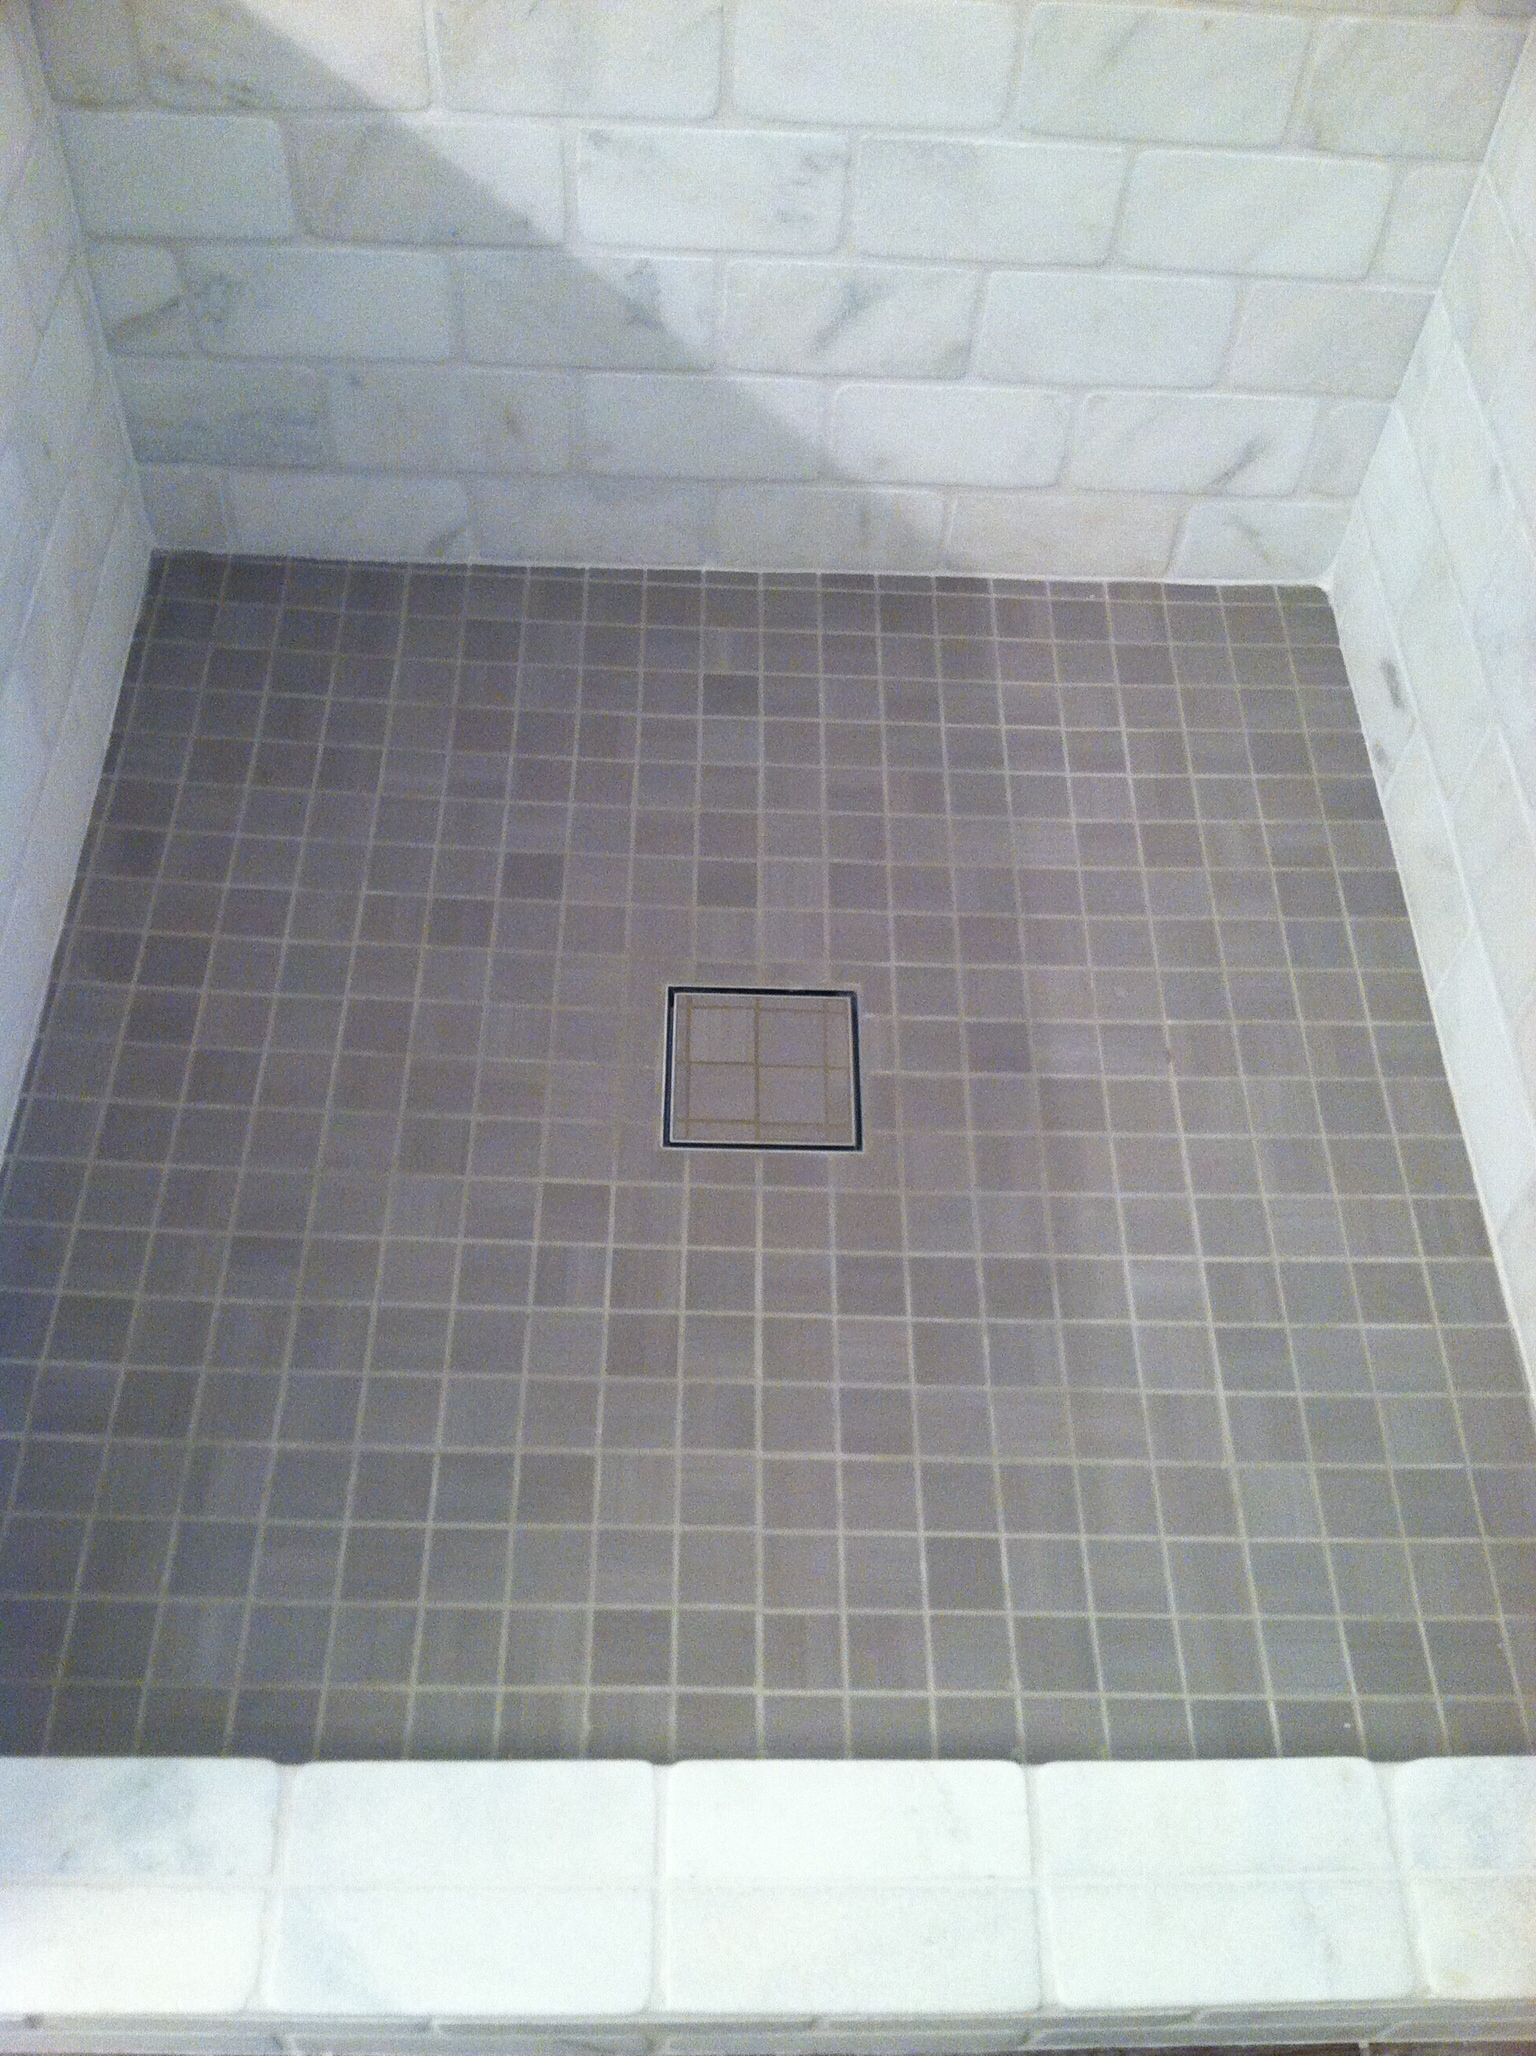 Hidden Shower Drain In Our Master Bathroom Hidden Shower Shower Drain Simple Bathroom Renovation